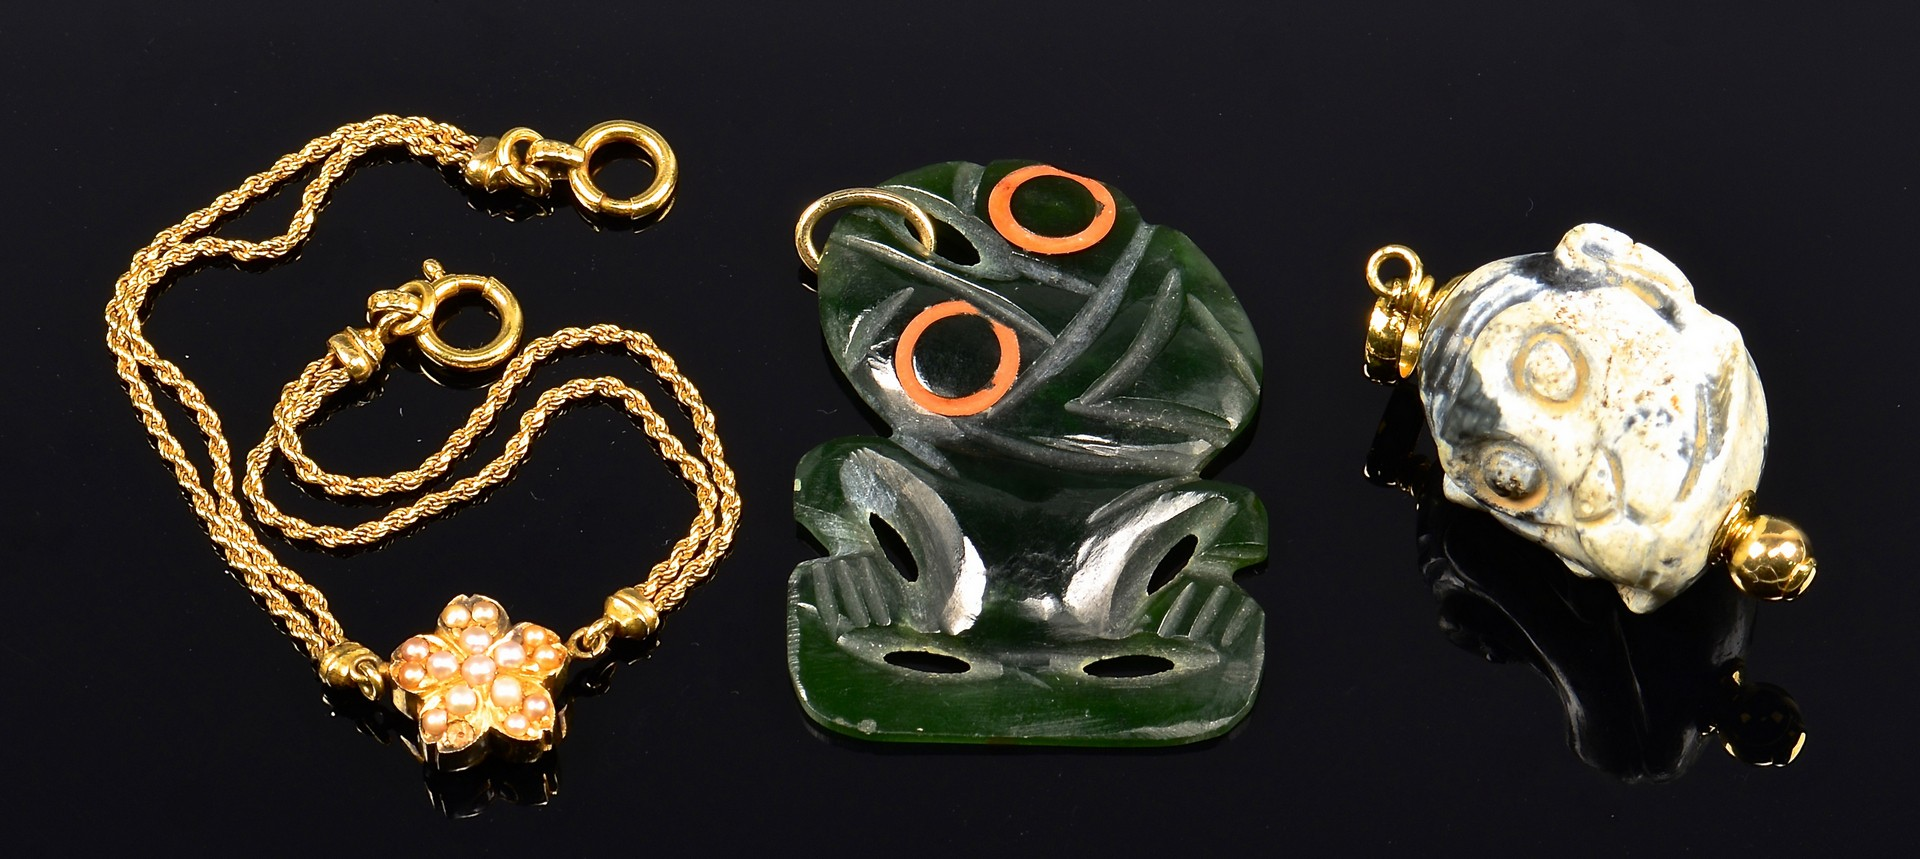 Lot 4010140: 3 Asian Jewelry items, incl. Jade